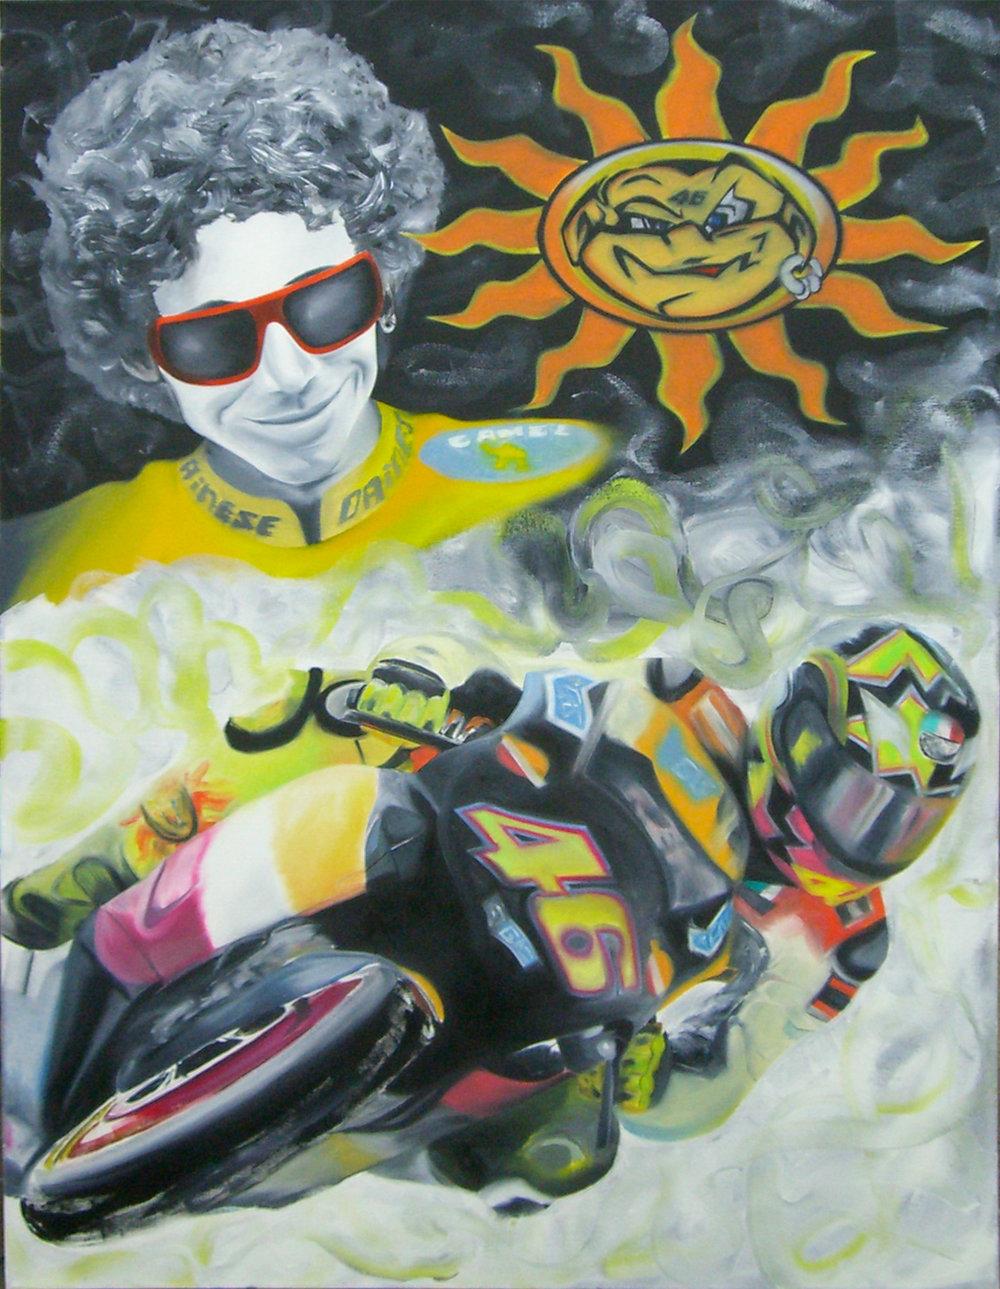 Valentino-Rossi-Painting.jpg